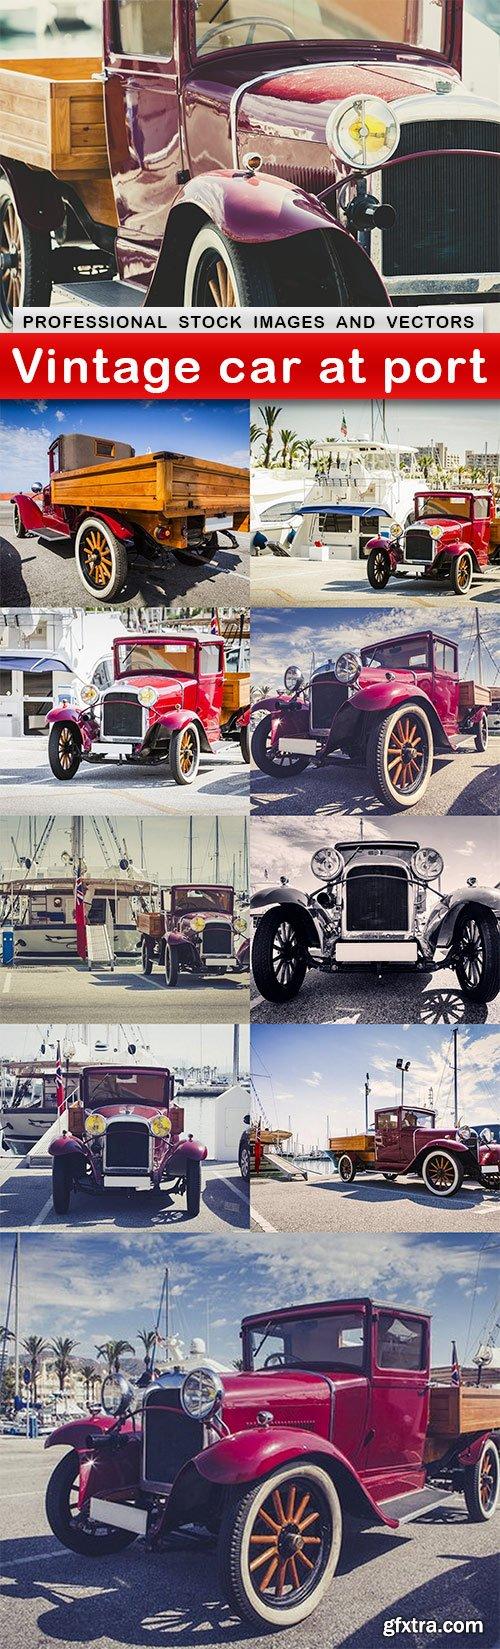 Vintage car at port - 10 UHQ JPEG